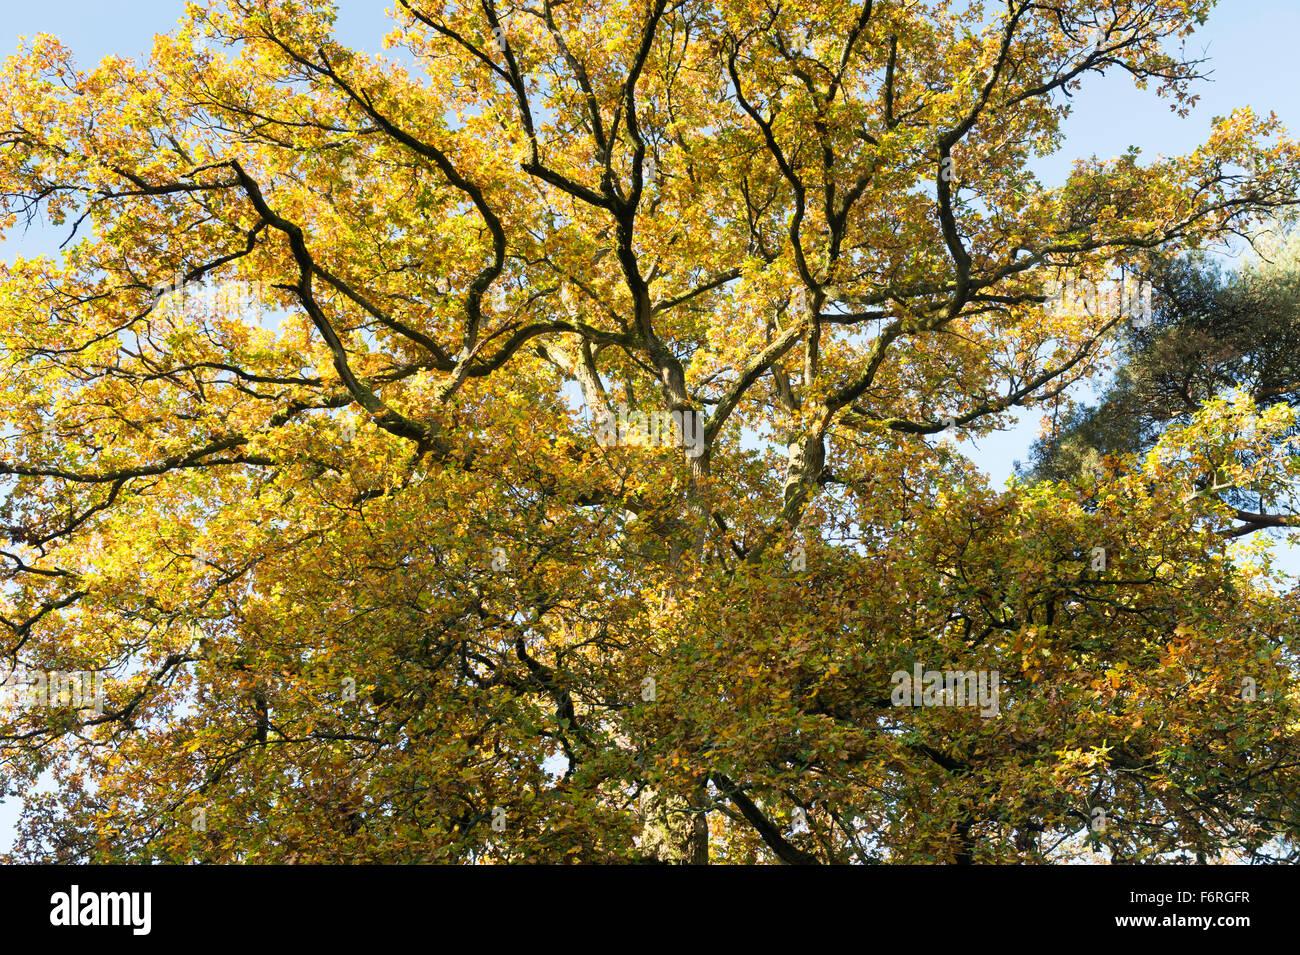 Quercus Robur Eiche Blatter Im Herbst Farbwechsel Baldachin Uk